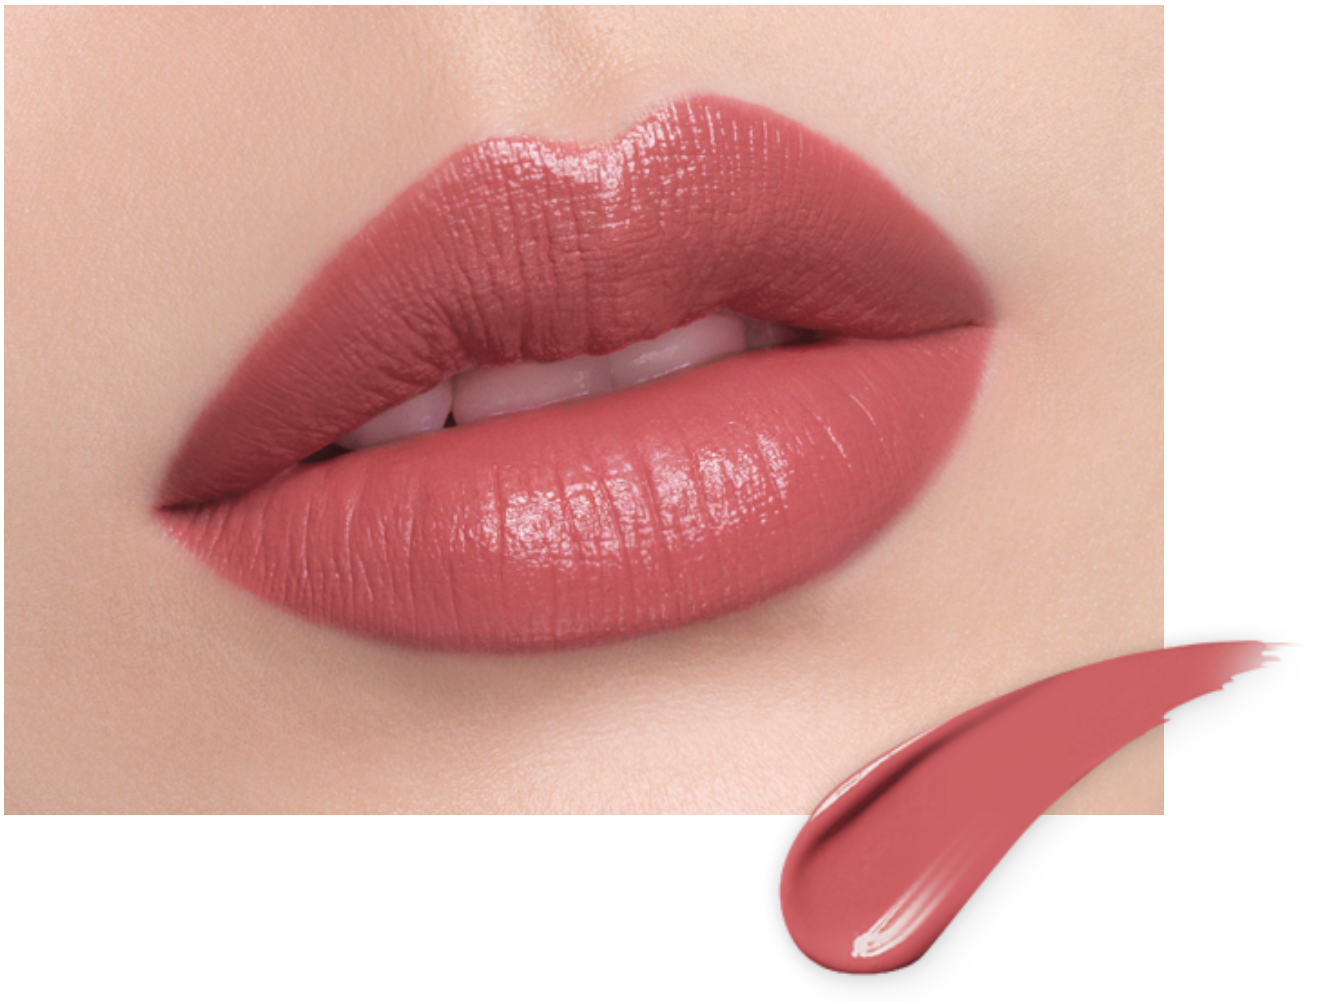 laneige-silk-intense-lipstick-521.png